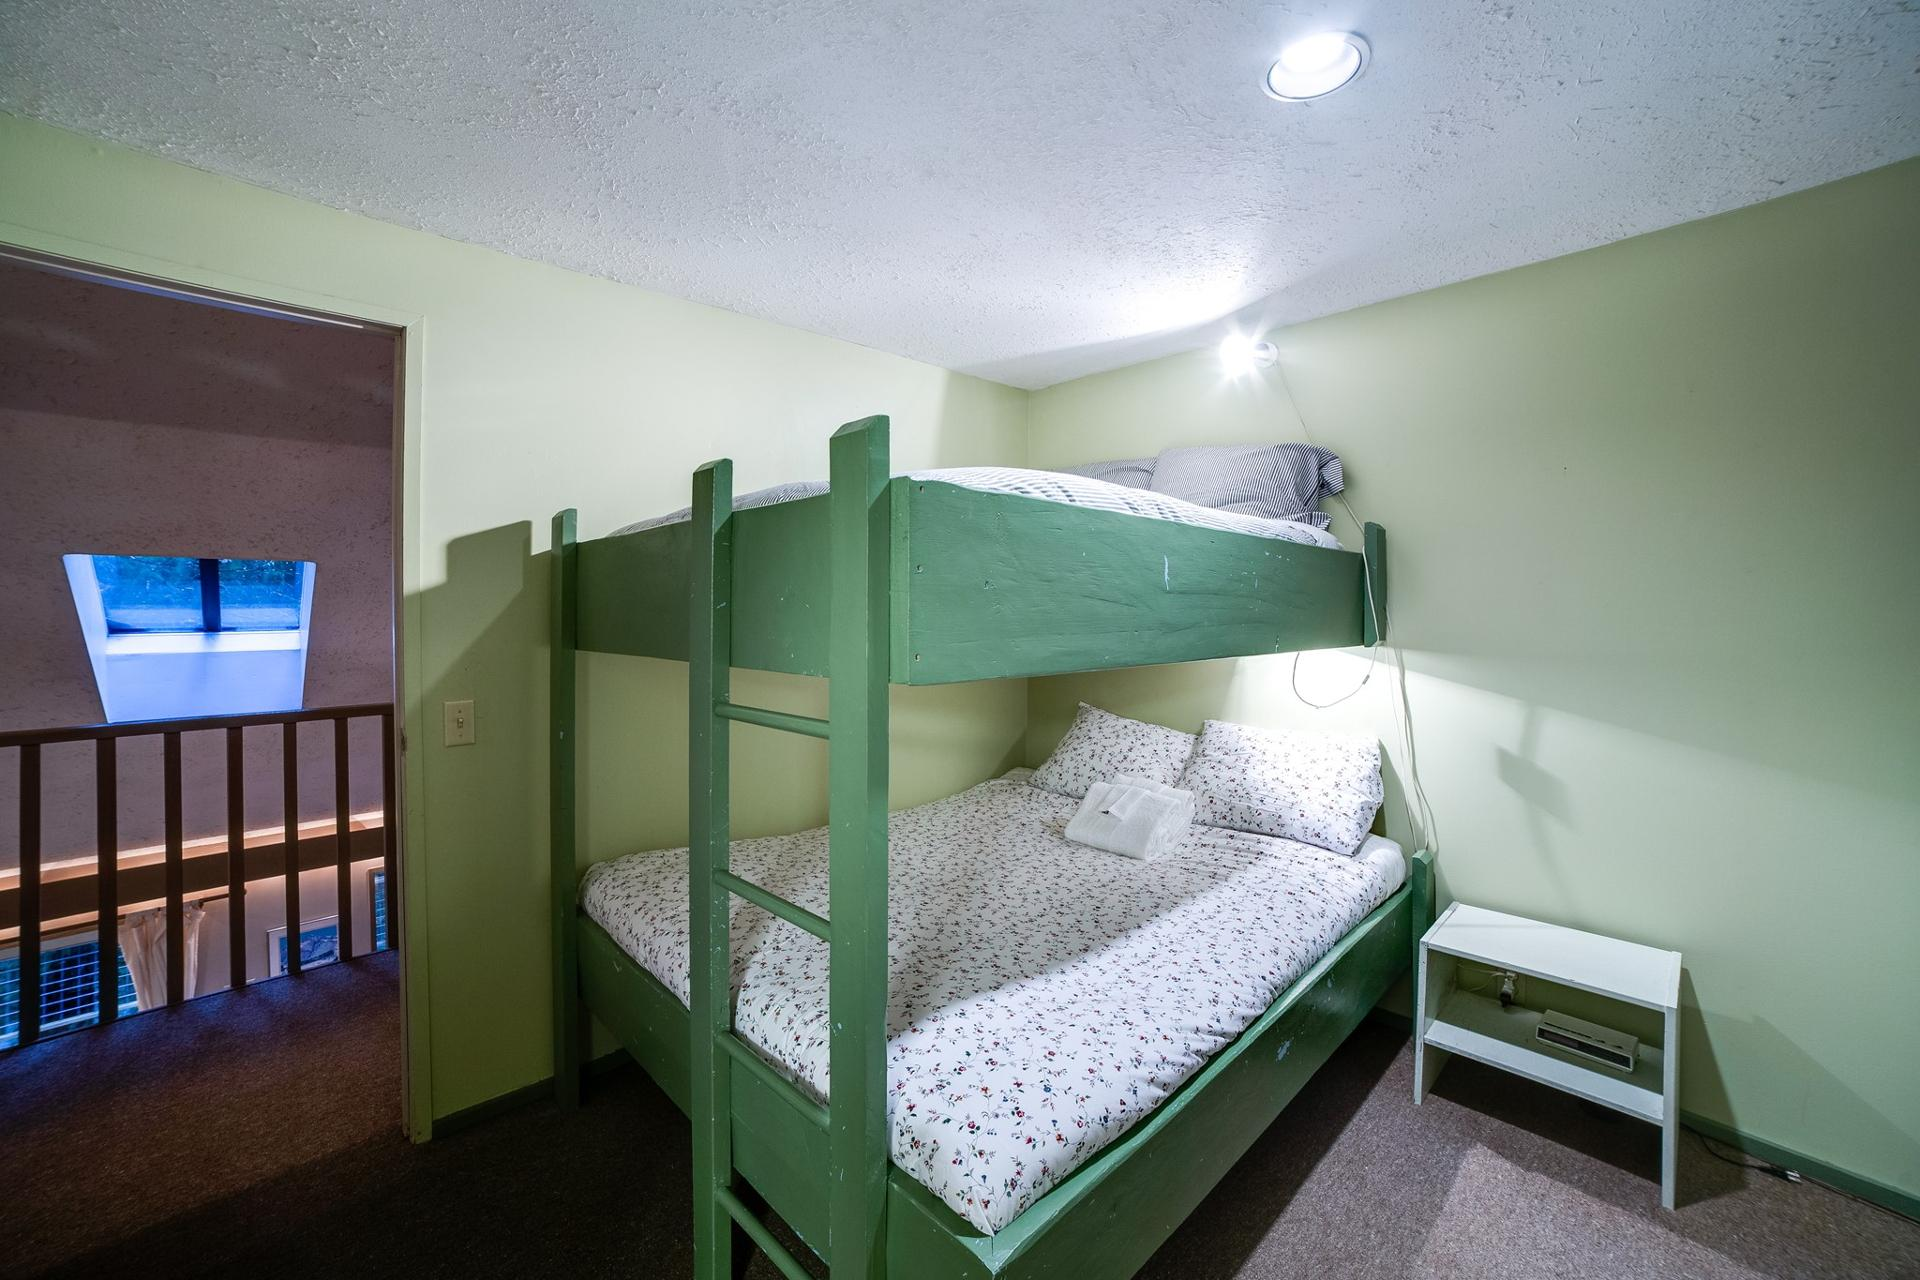 Apartment Mt  Baker Lodging Cabin  55 - HOT TUB  WOOD STOVE  BBQ  SLEEPS 10  photo 3999995